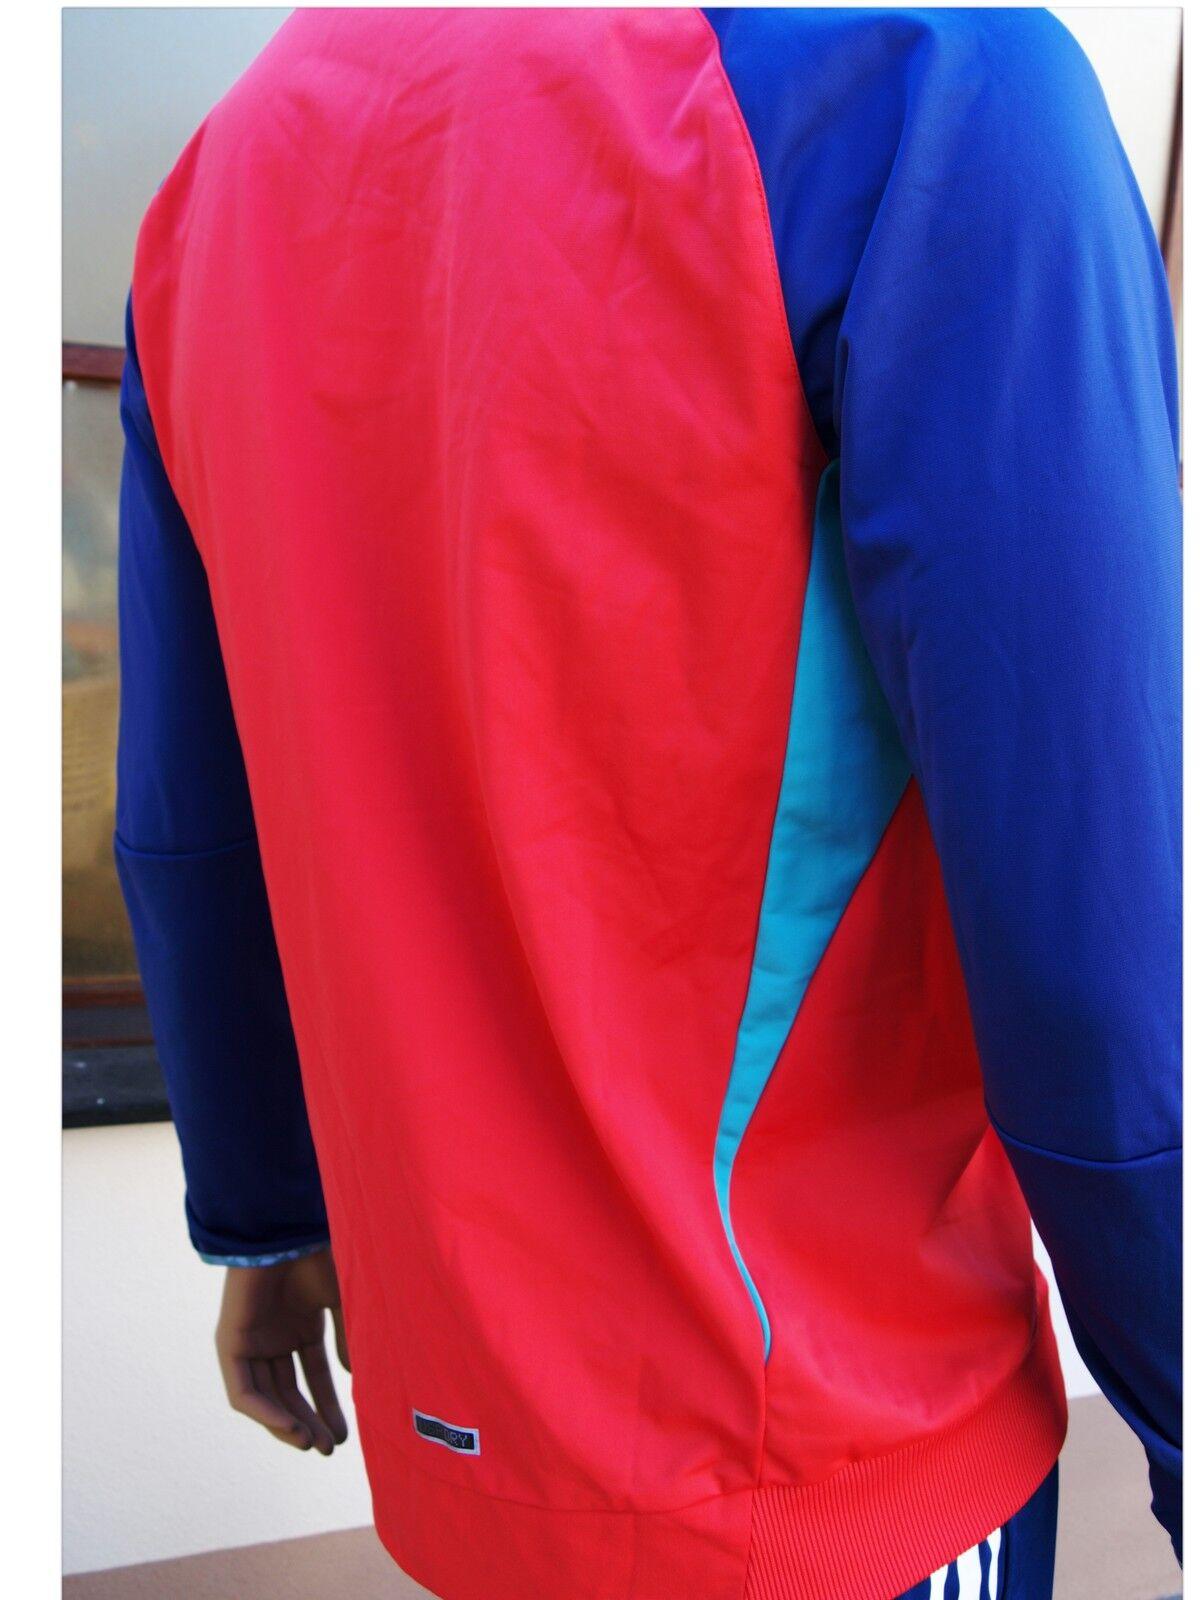 PUMA Apex Track Jacket Herren Trainingsjacke Jacke Sport Freizeit grün Gr. S NEU | eBay